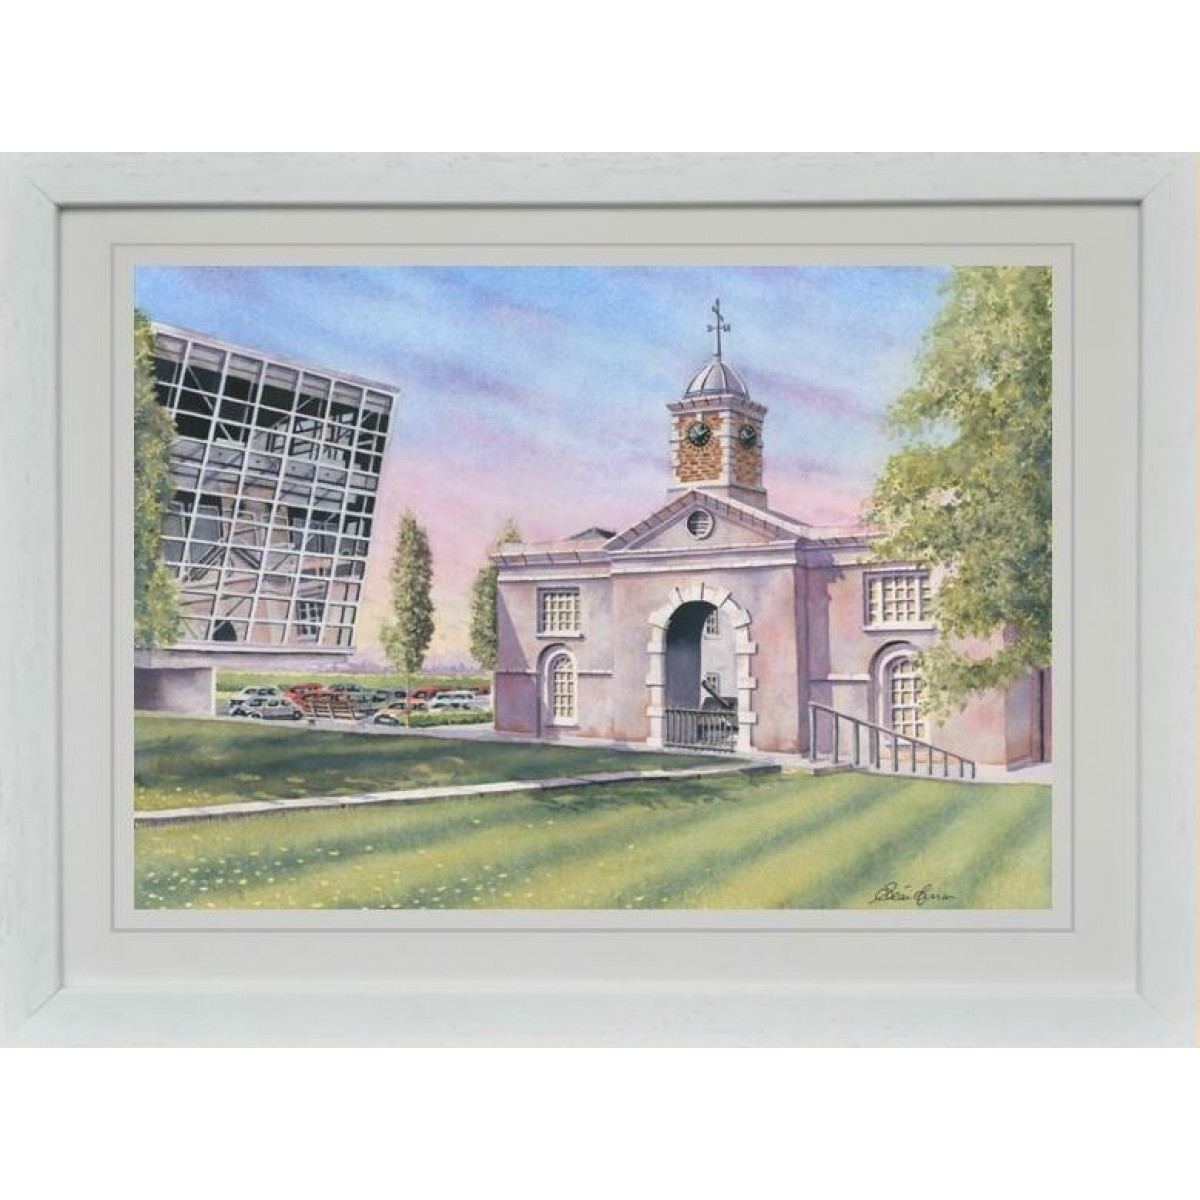 """The Clock Tower, Devoy Barracks, Naas"""